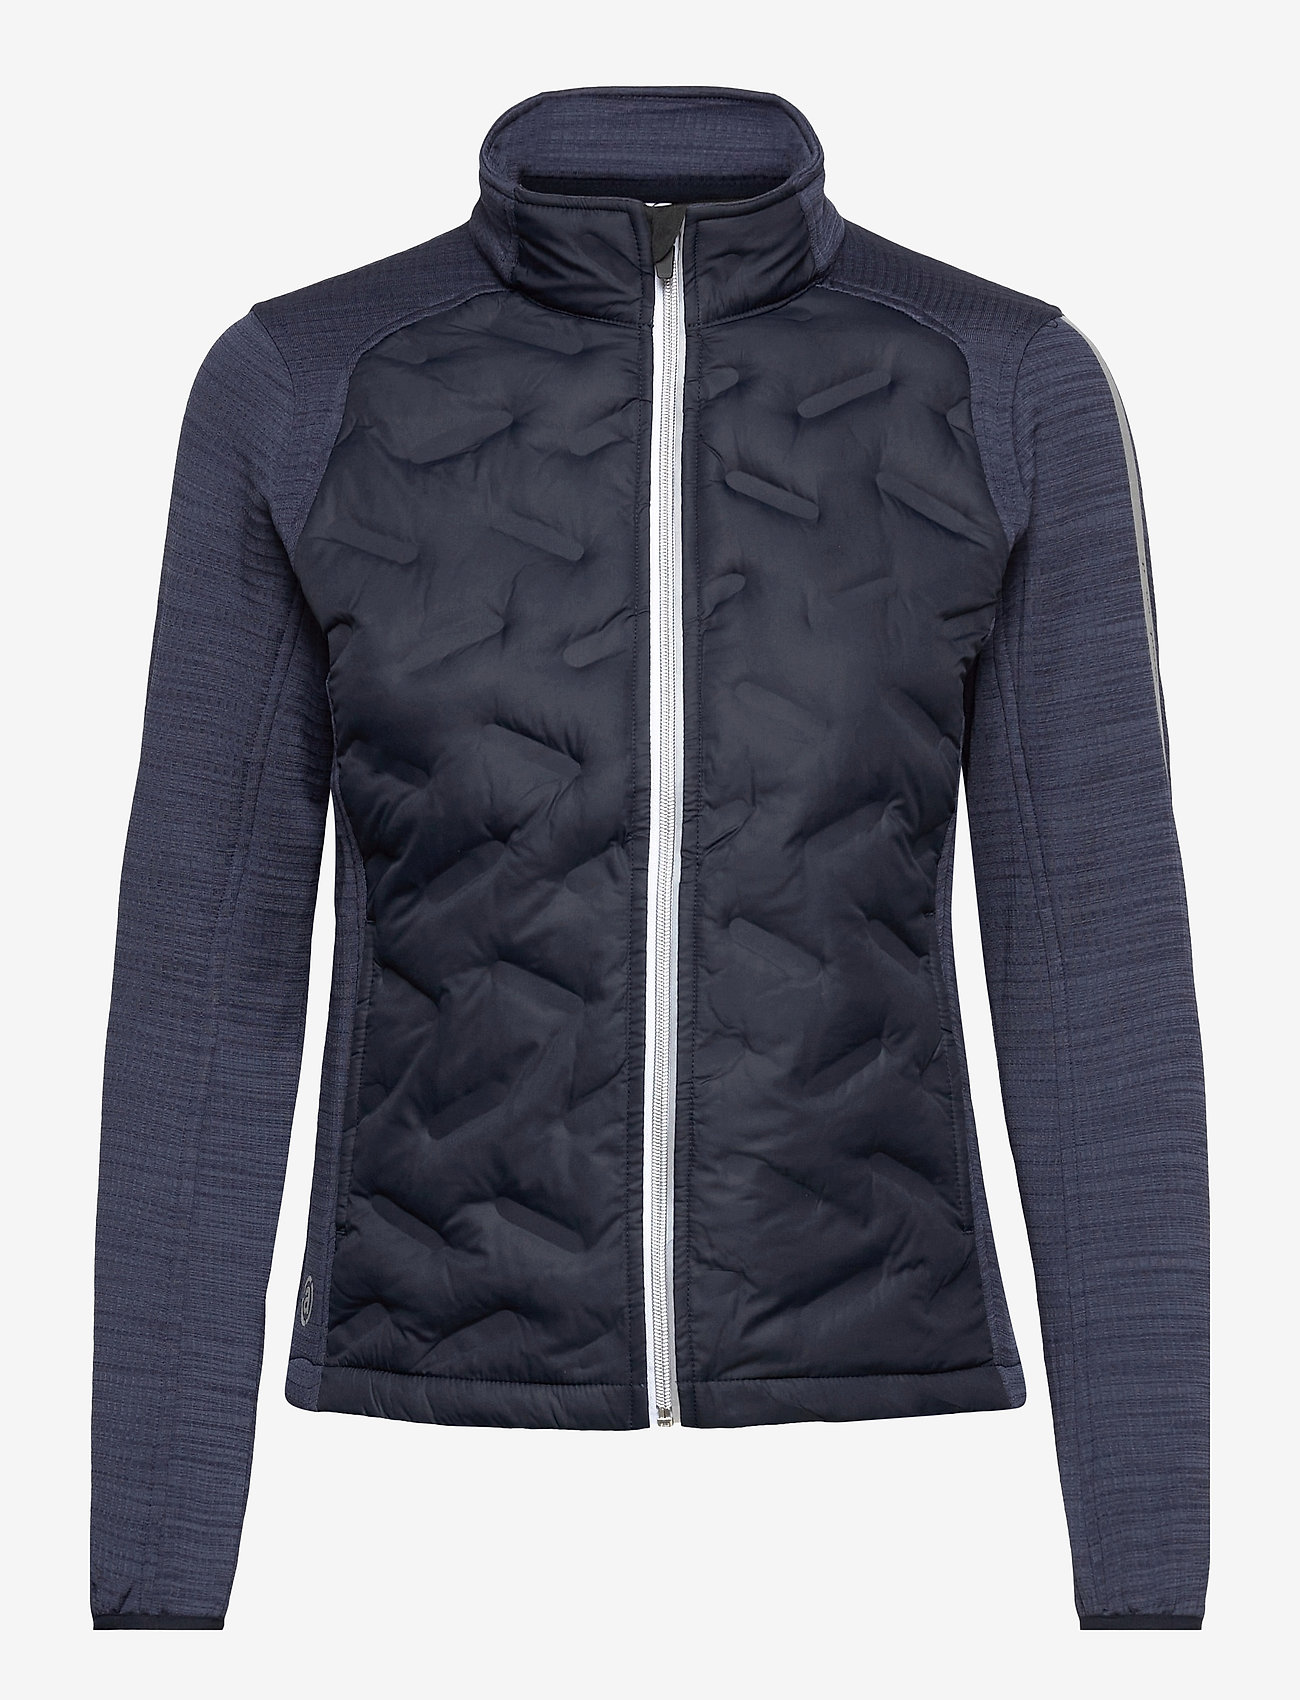 Abacus - Lds Dunes hybrid jacket - golf jassen - navy - 0